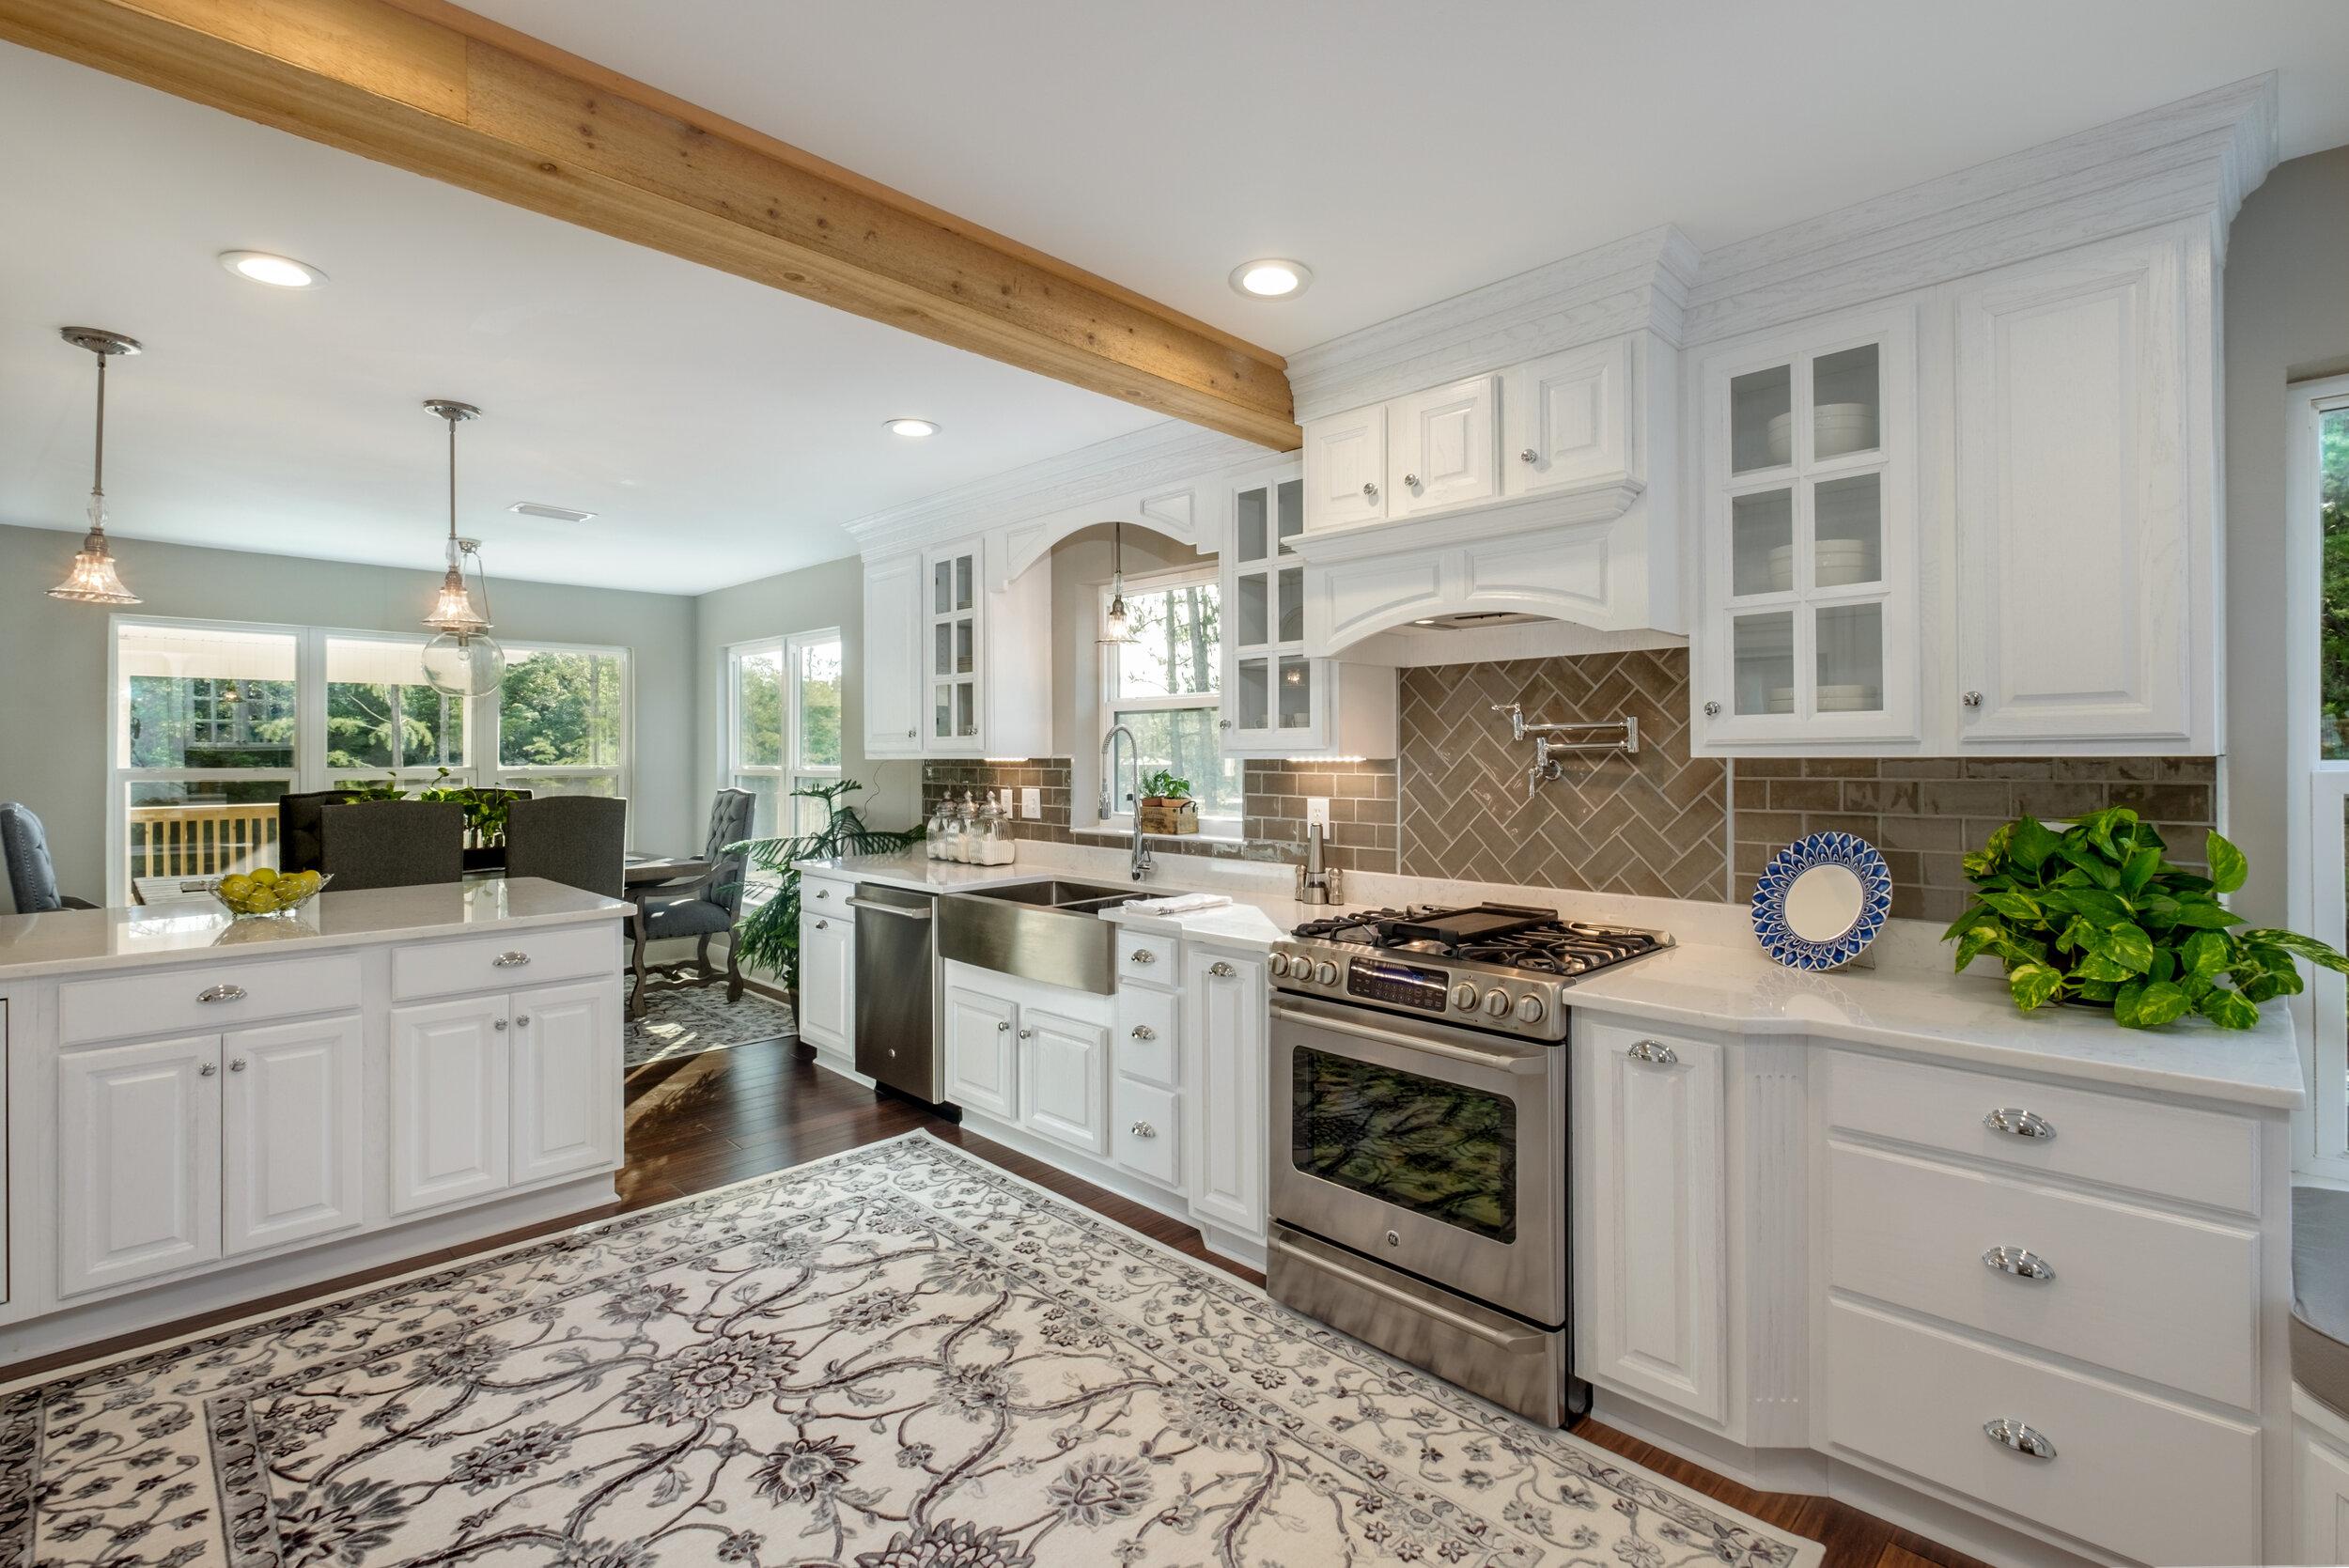 Cumberland oak white kitchen project in DeSoto, MS